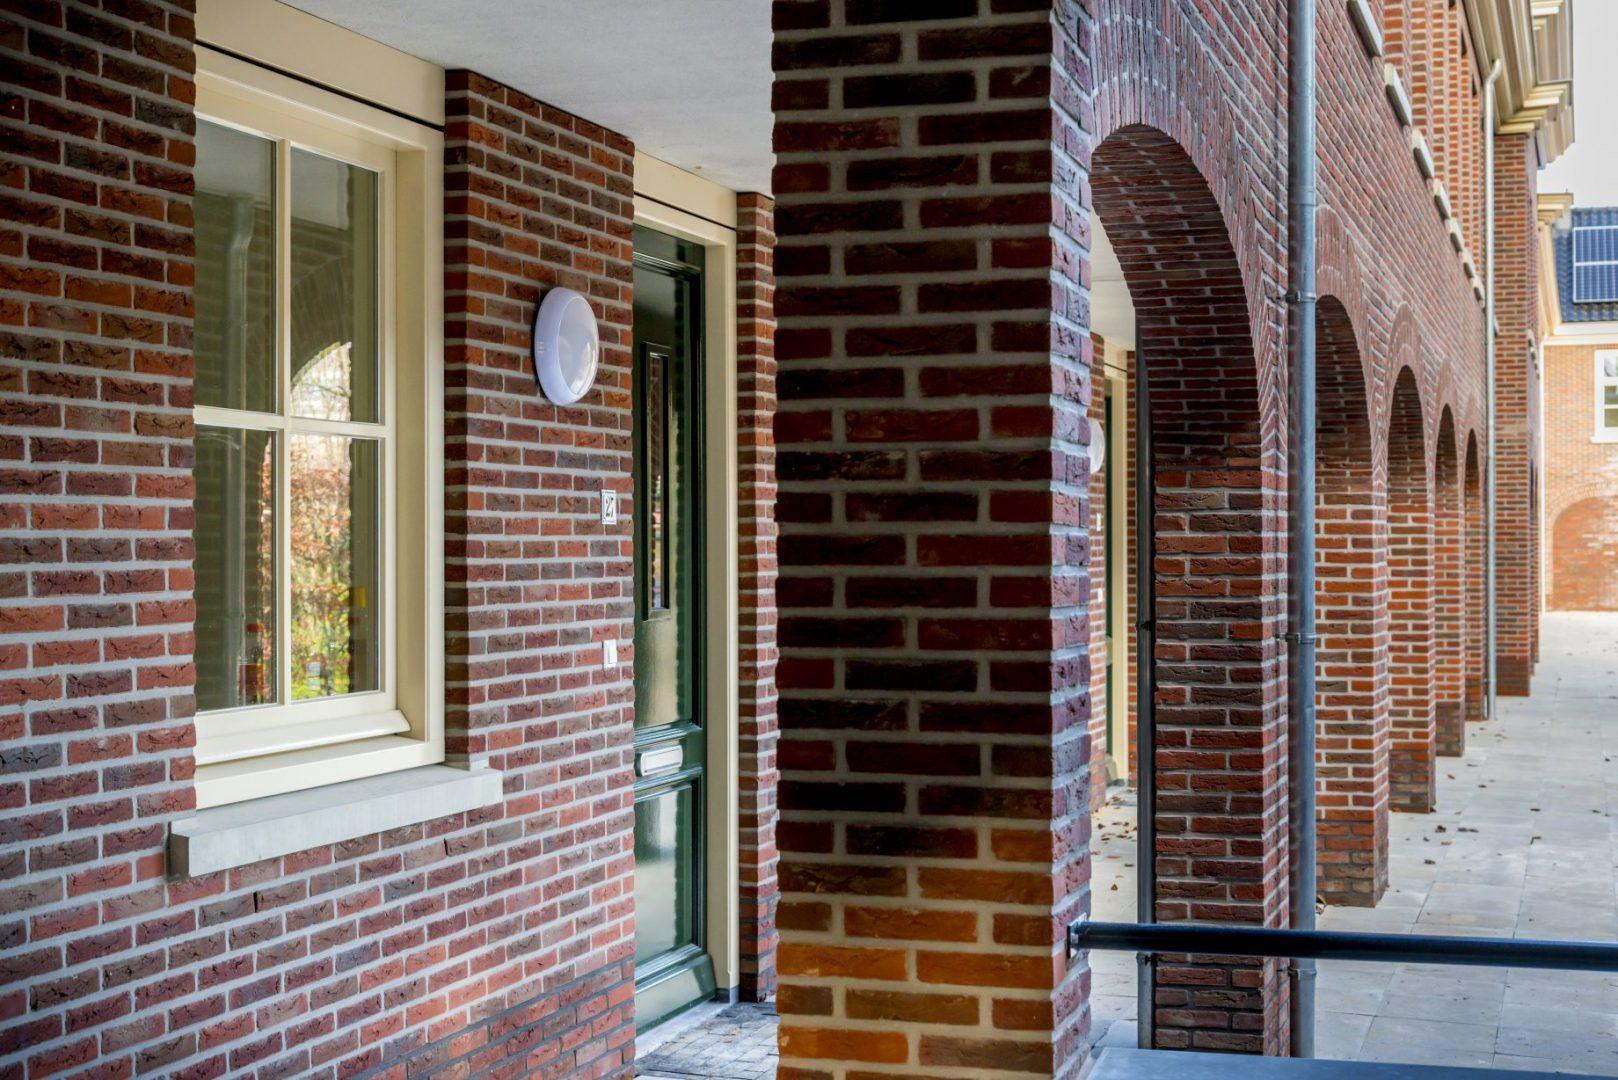 Ringershof-renovatie-ZIJLSTRA-SCHIPPER-architecten-architectenbureau-noord-holland-architect-009